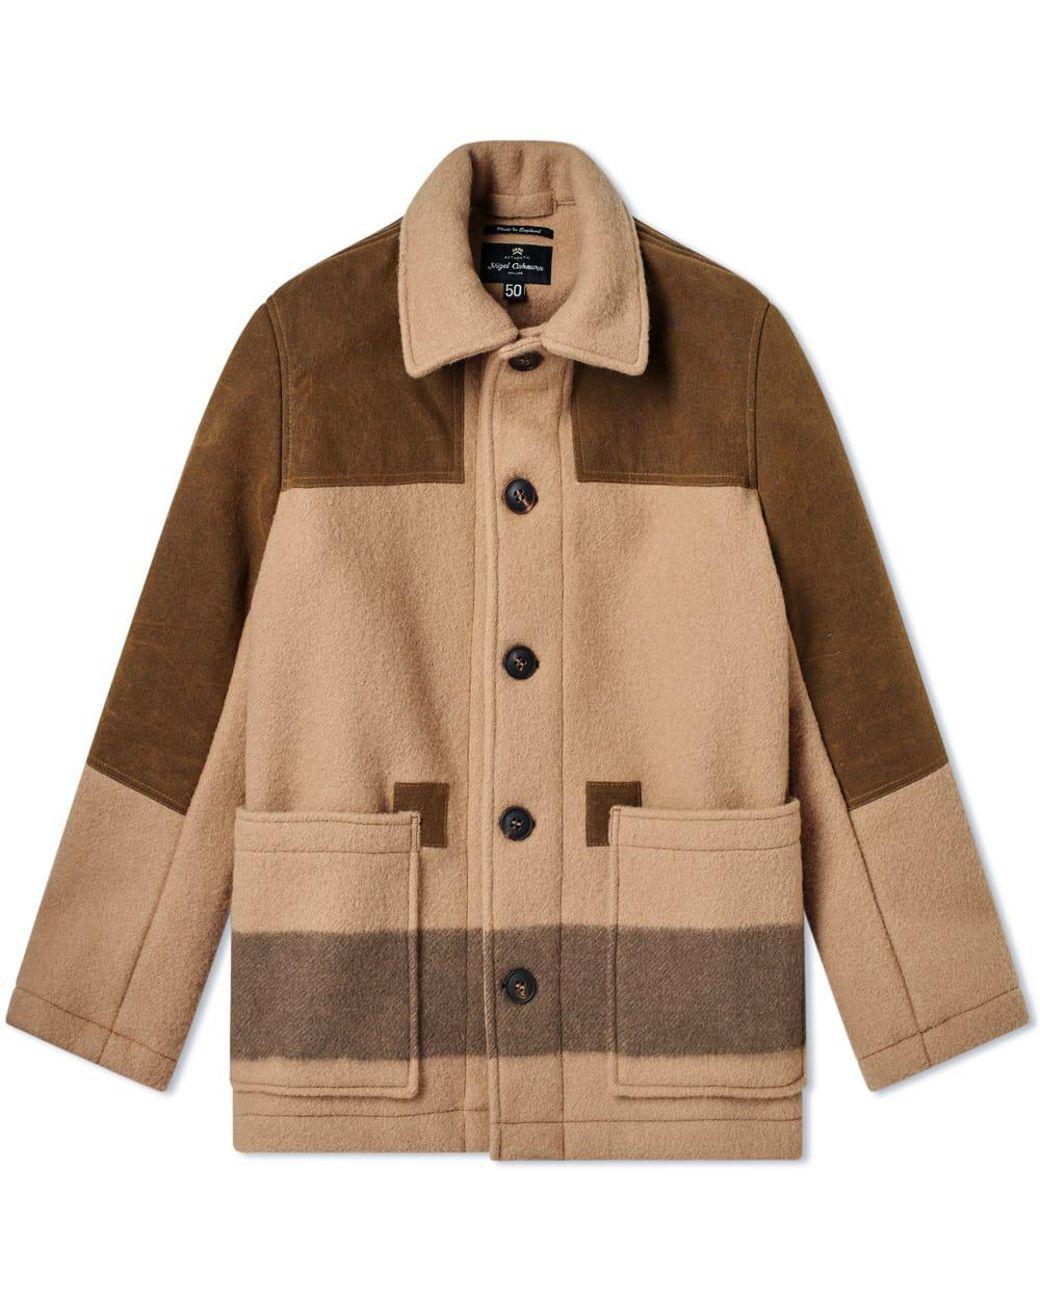 d1b464b6adba Lyst - Nigel Cabourn Donkey Jacket in Brown for Men